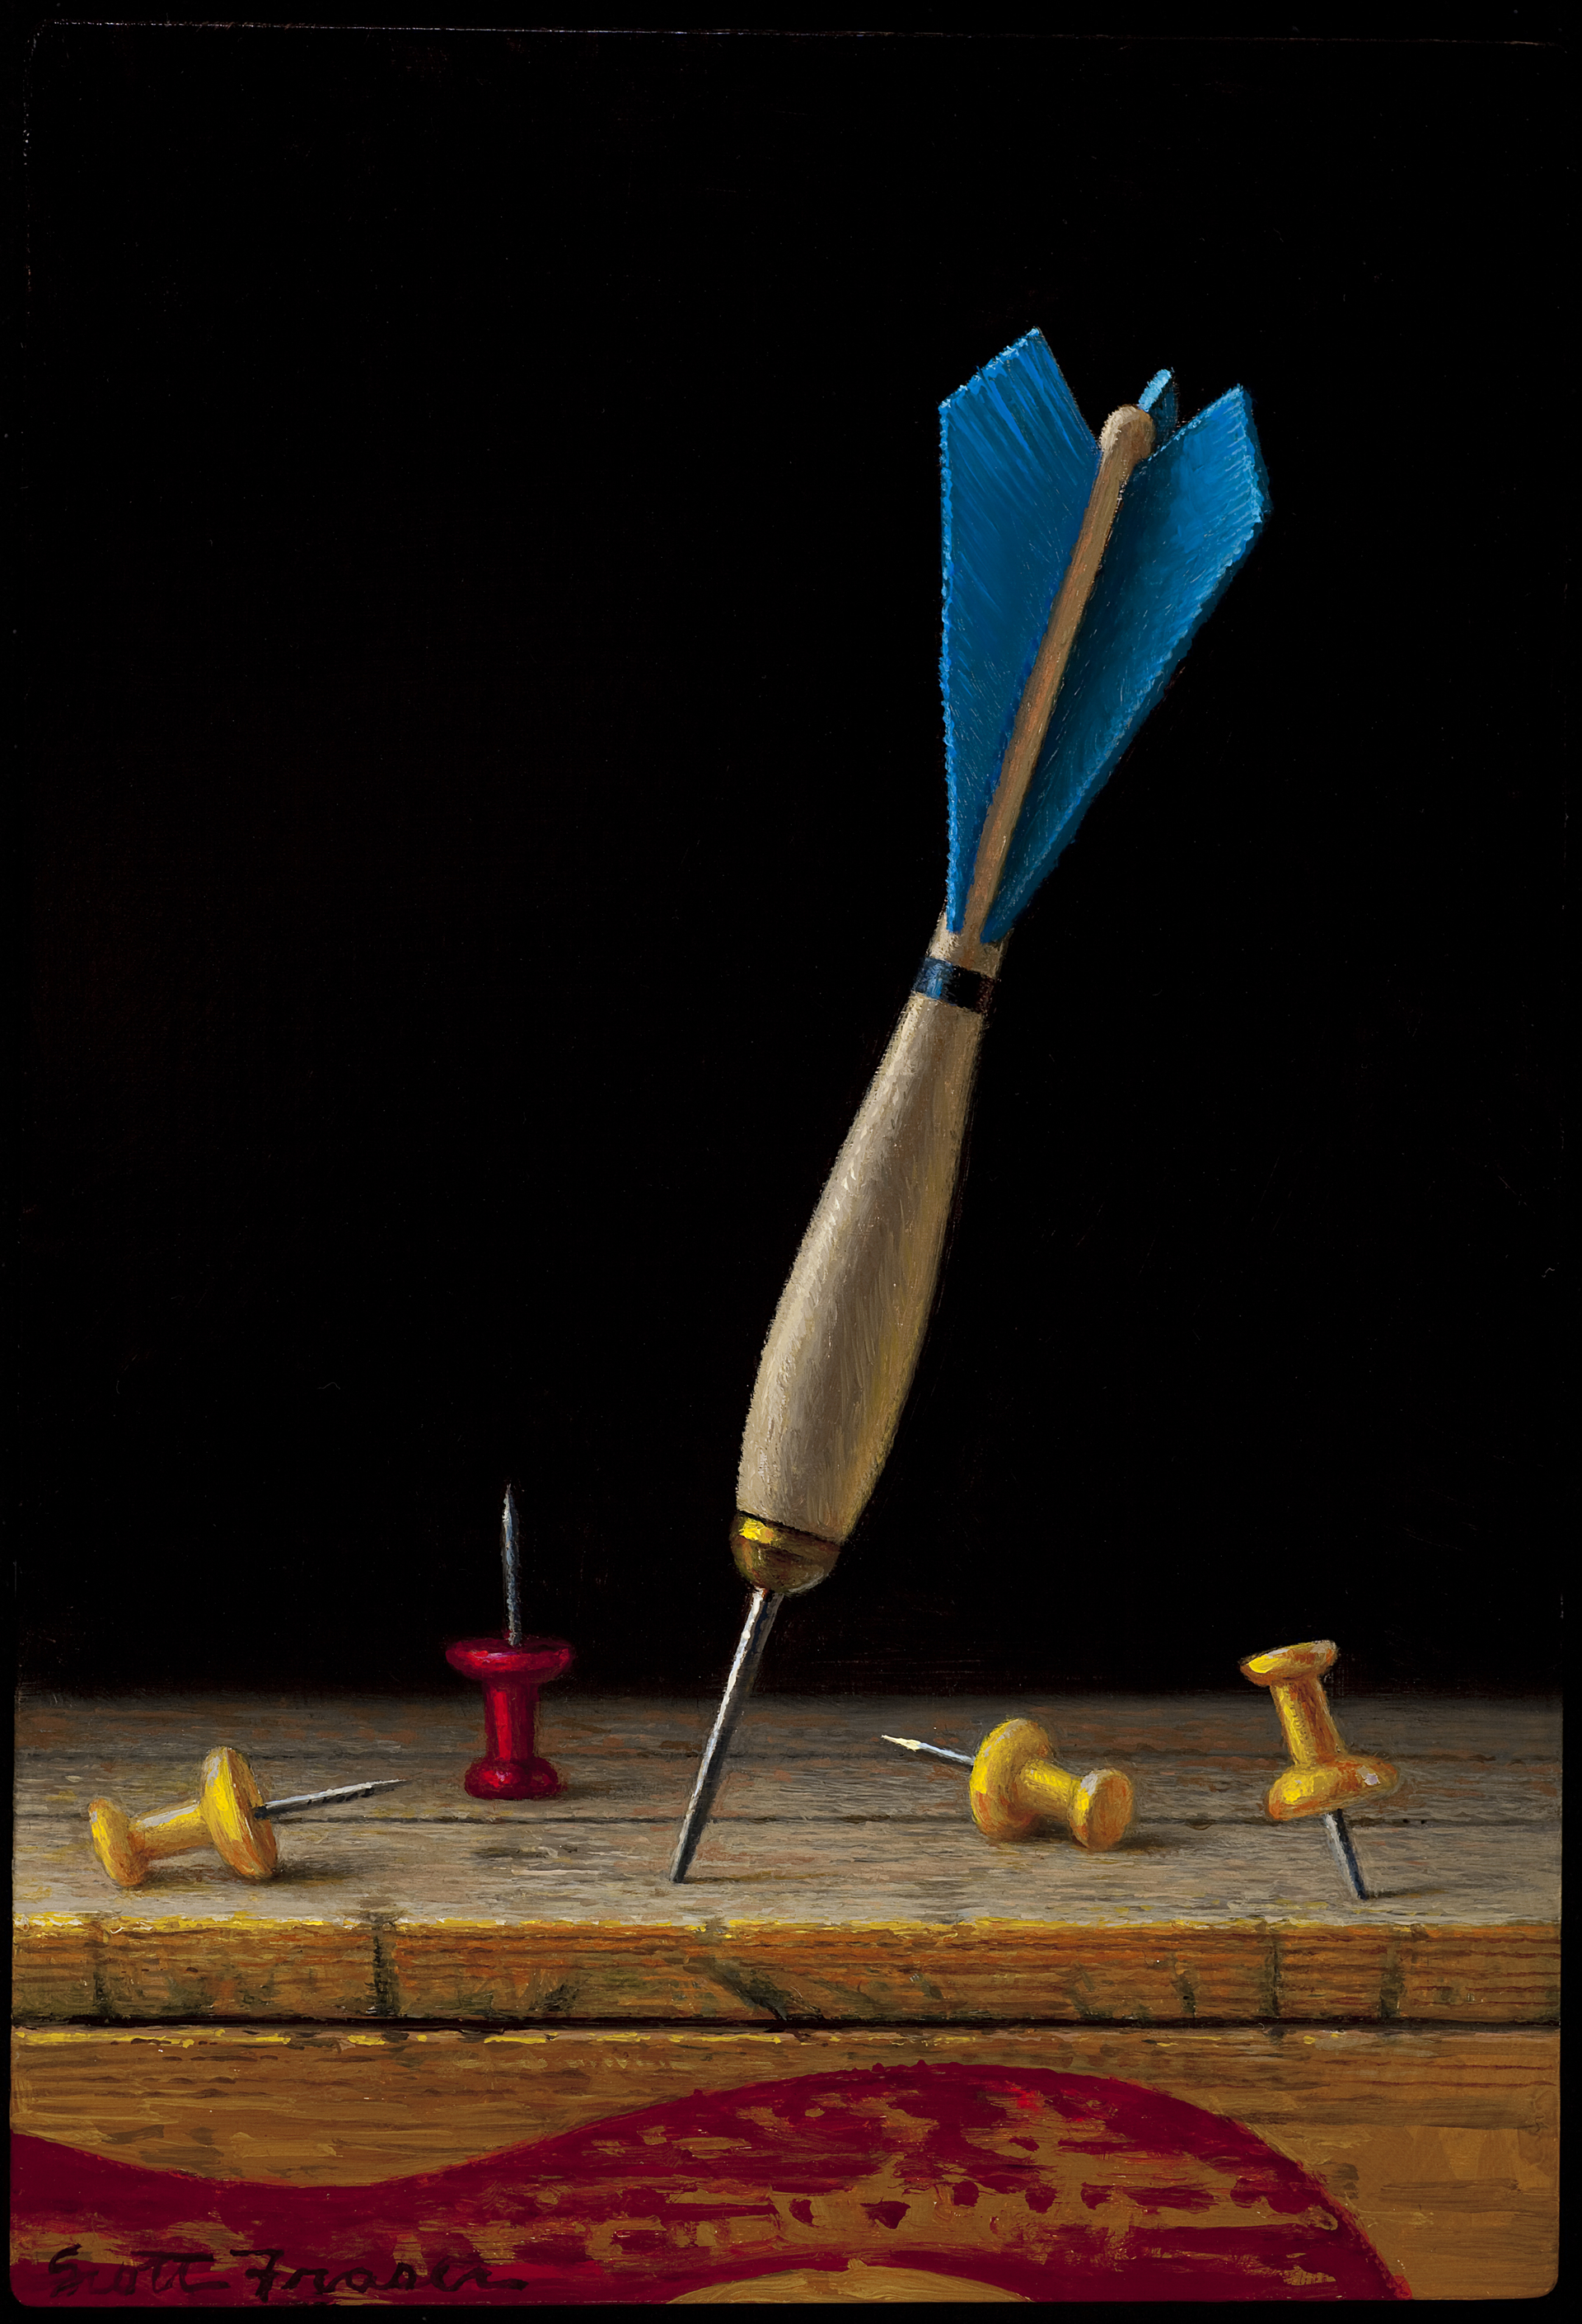 Dart with Push Pins by Scott Fraser